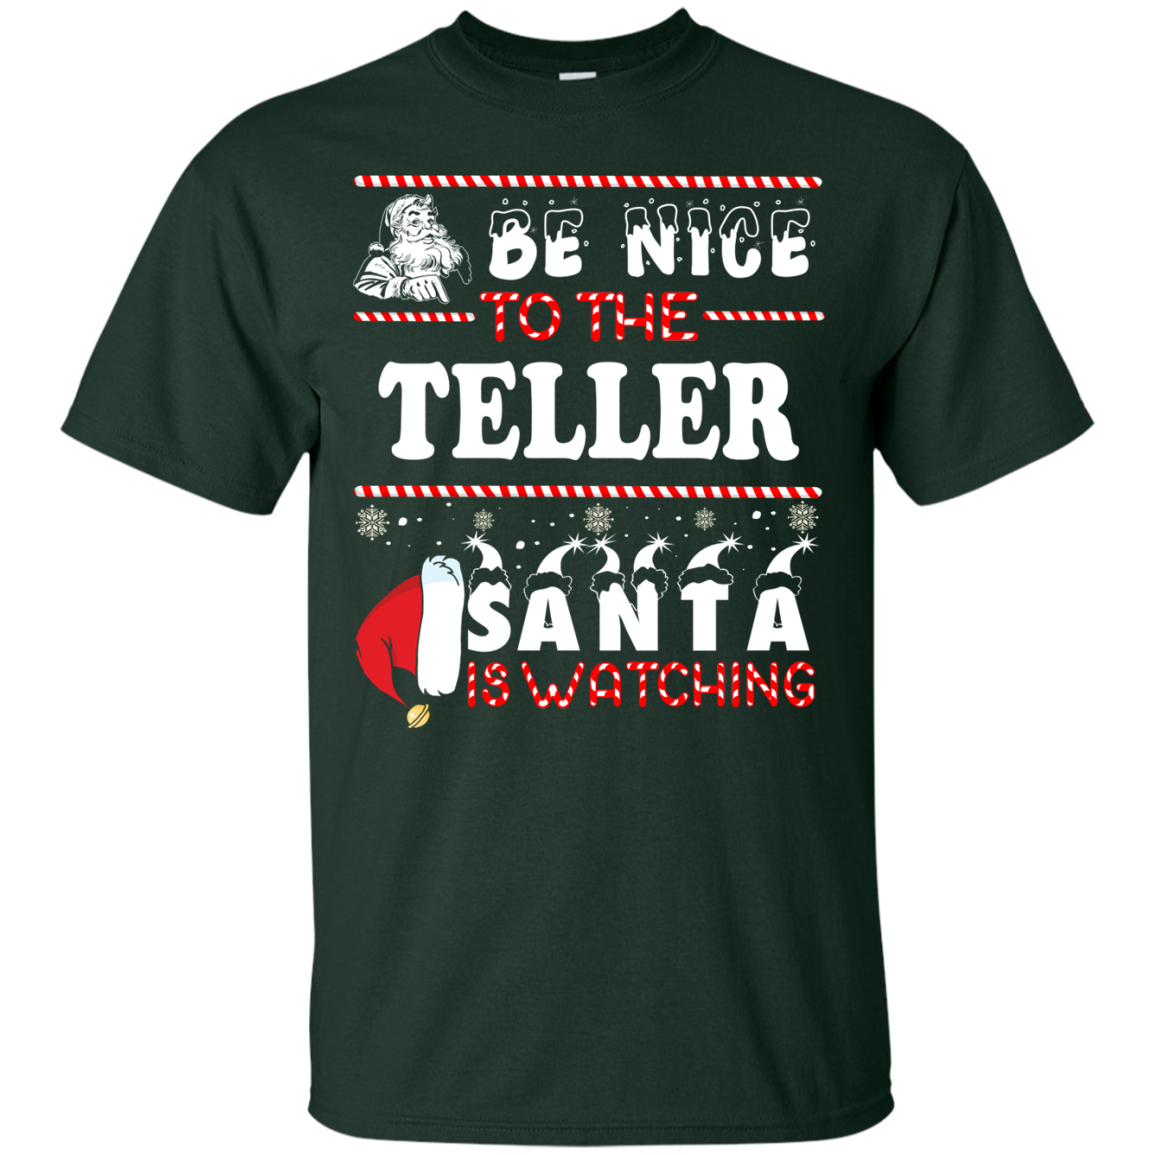 Be Nice To The Teller Santa Is Watching Sweatshirt, T-Shirt